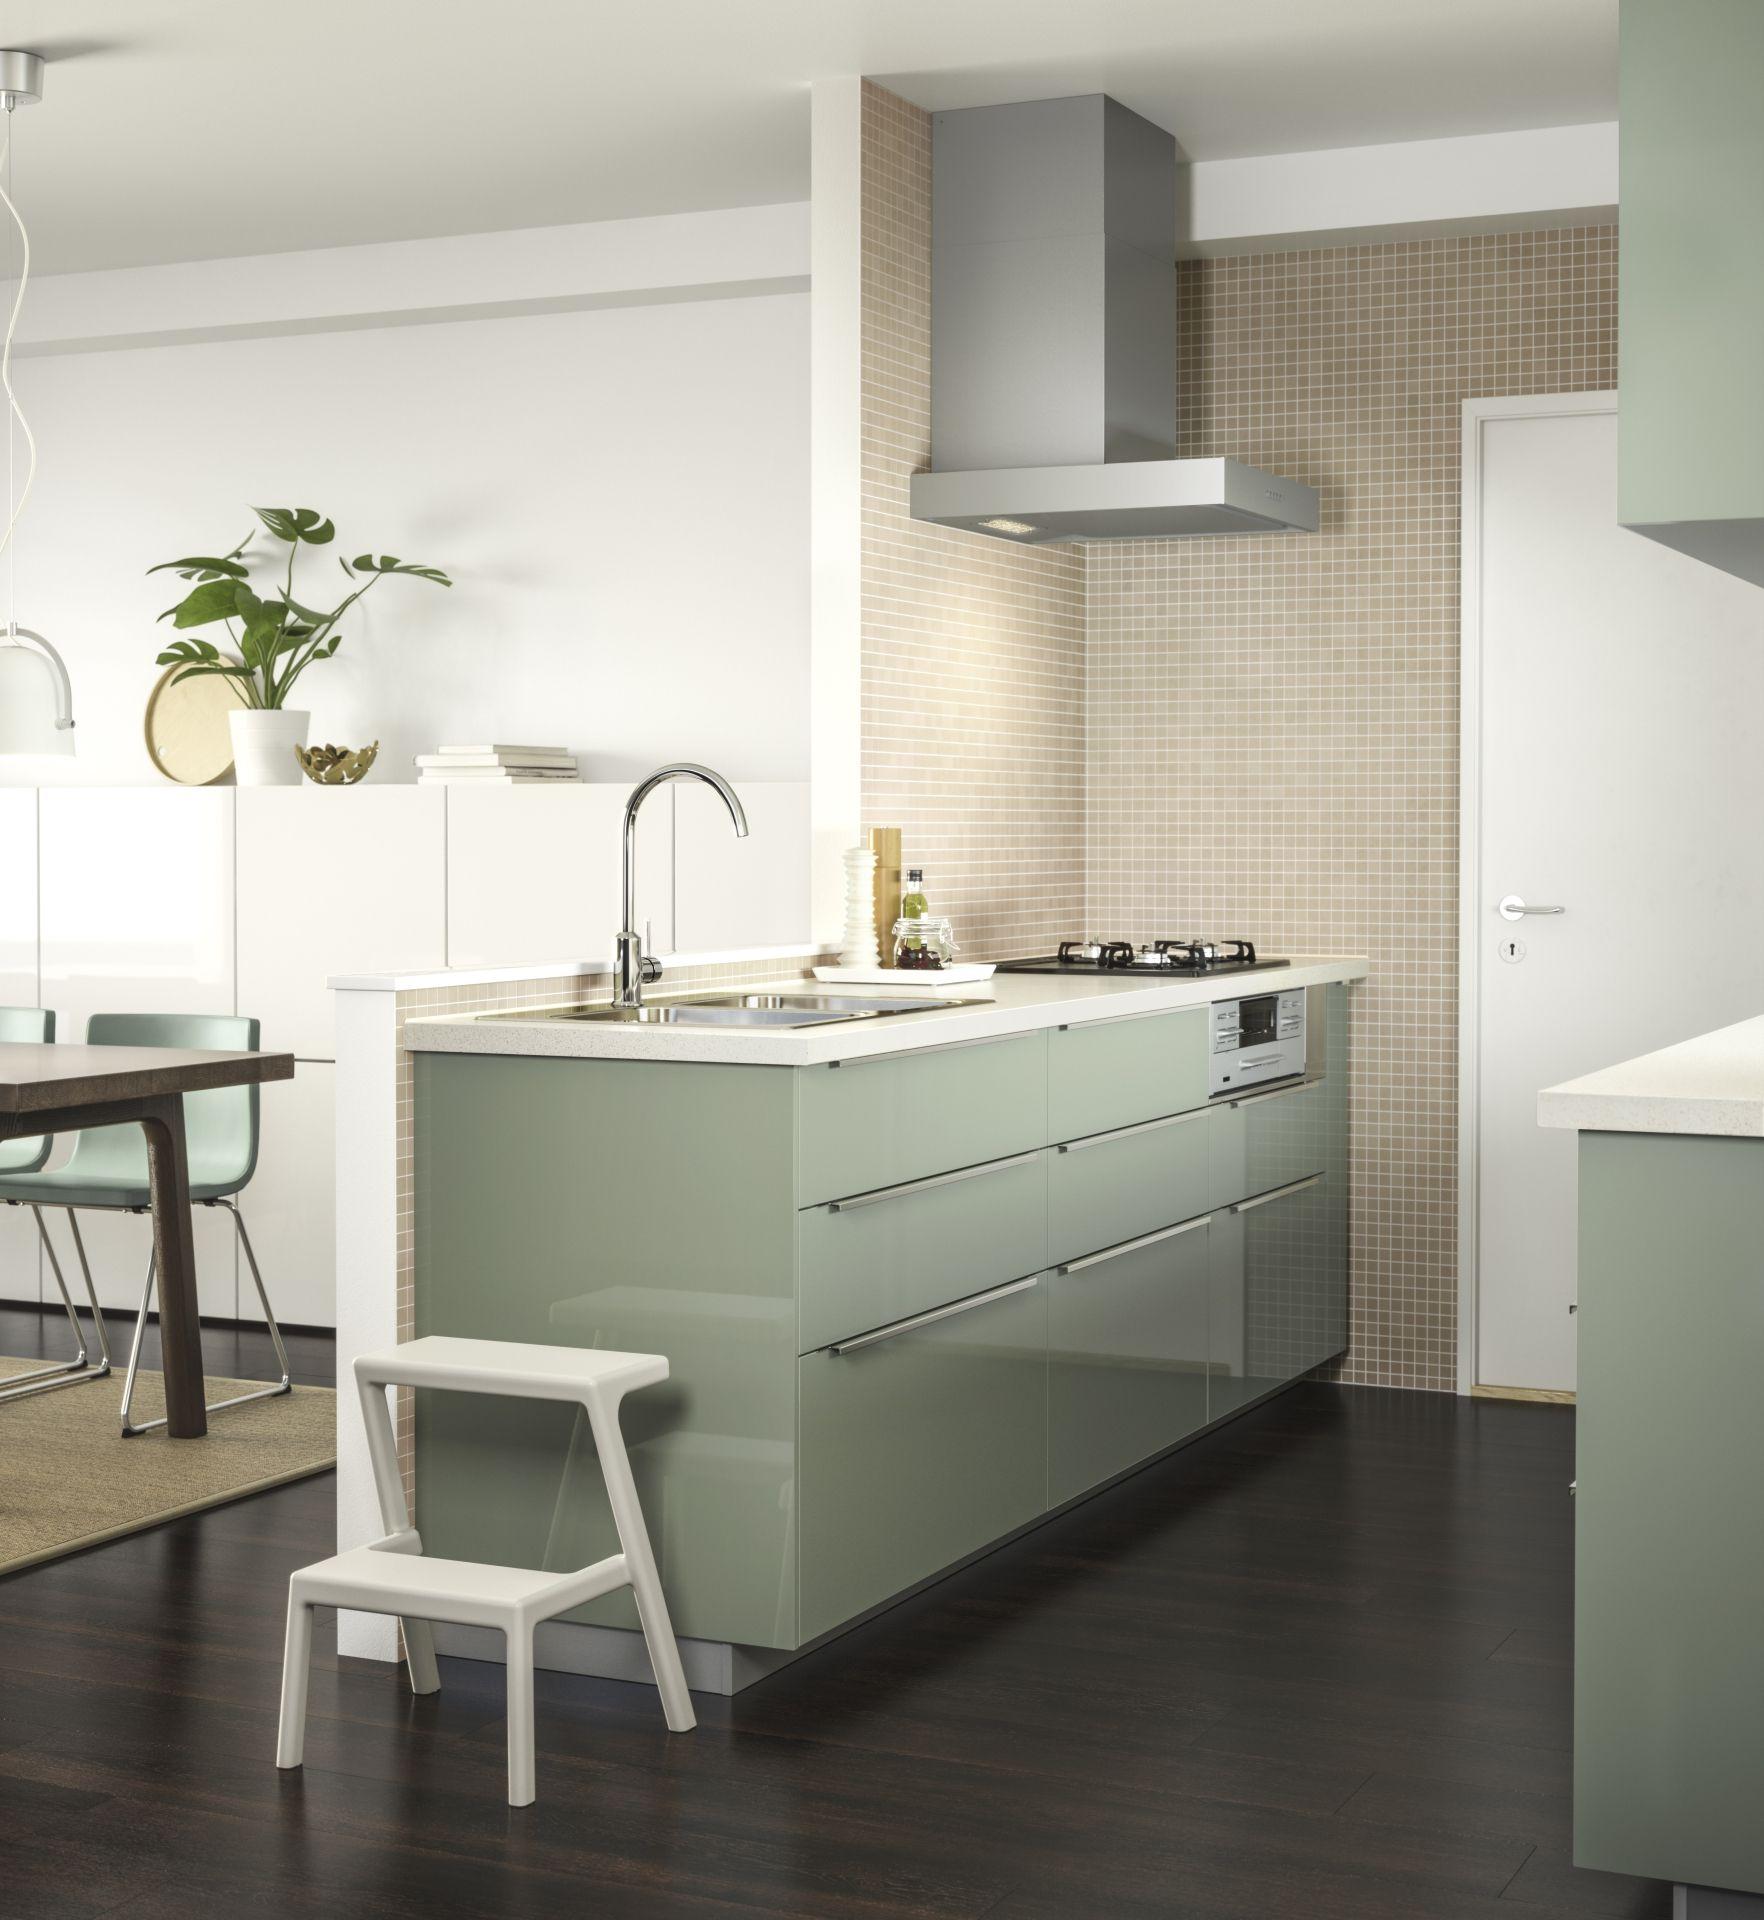 Ikea keukens for Keuken samenstellen ikea